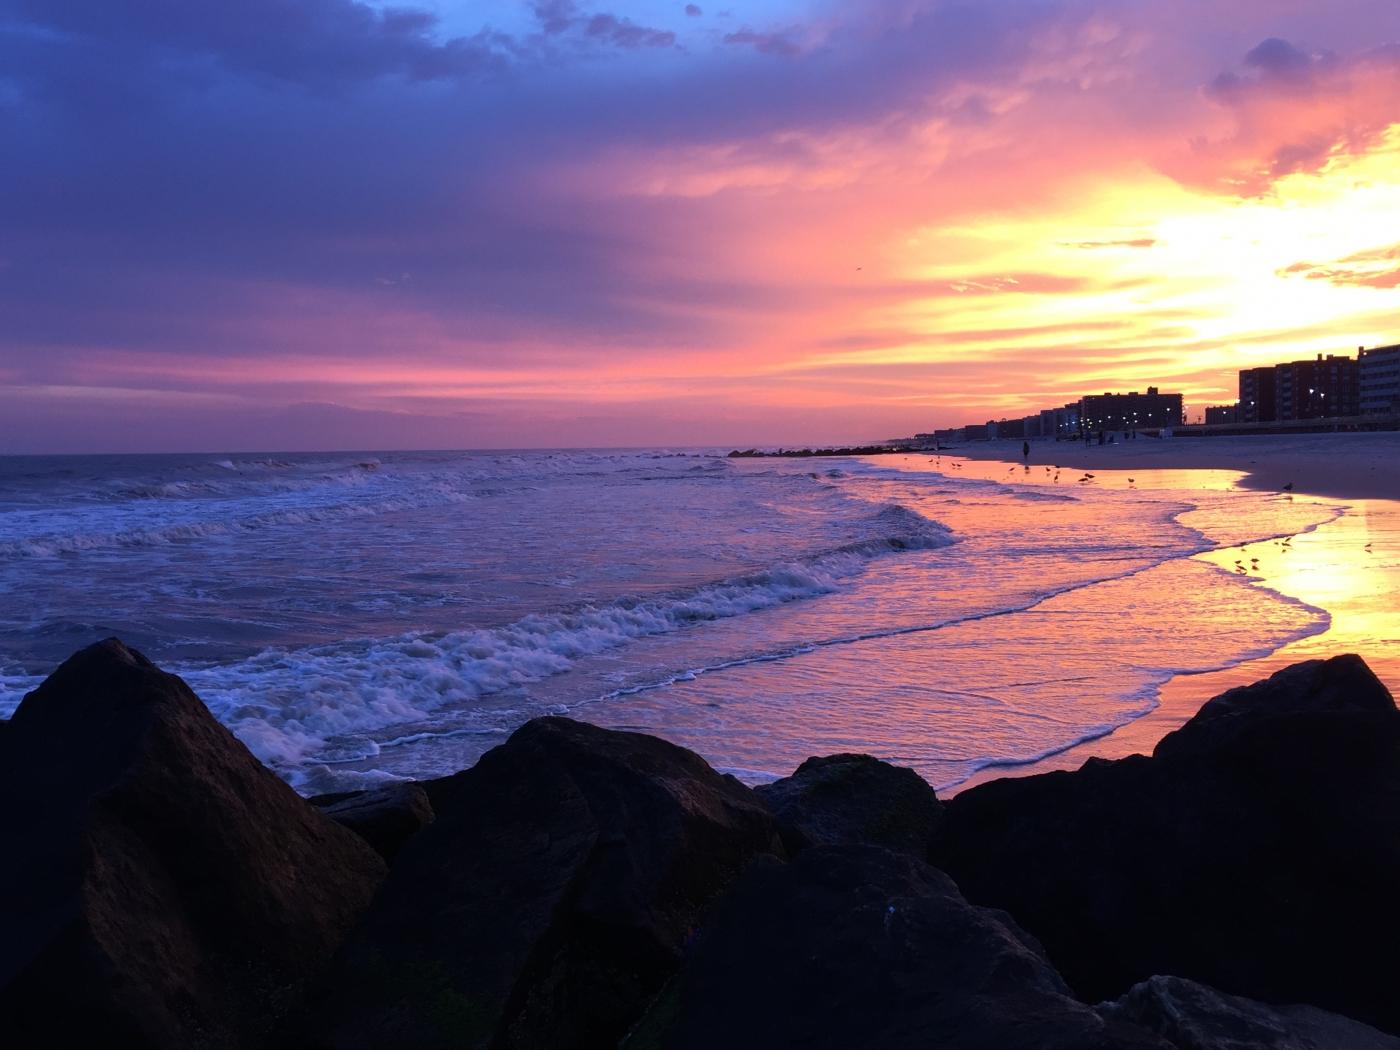 Long Beach 铺天盖地的晚霞(手机)_图1-16